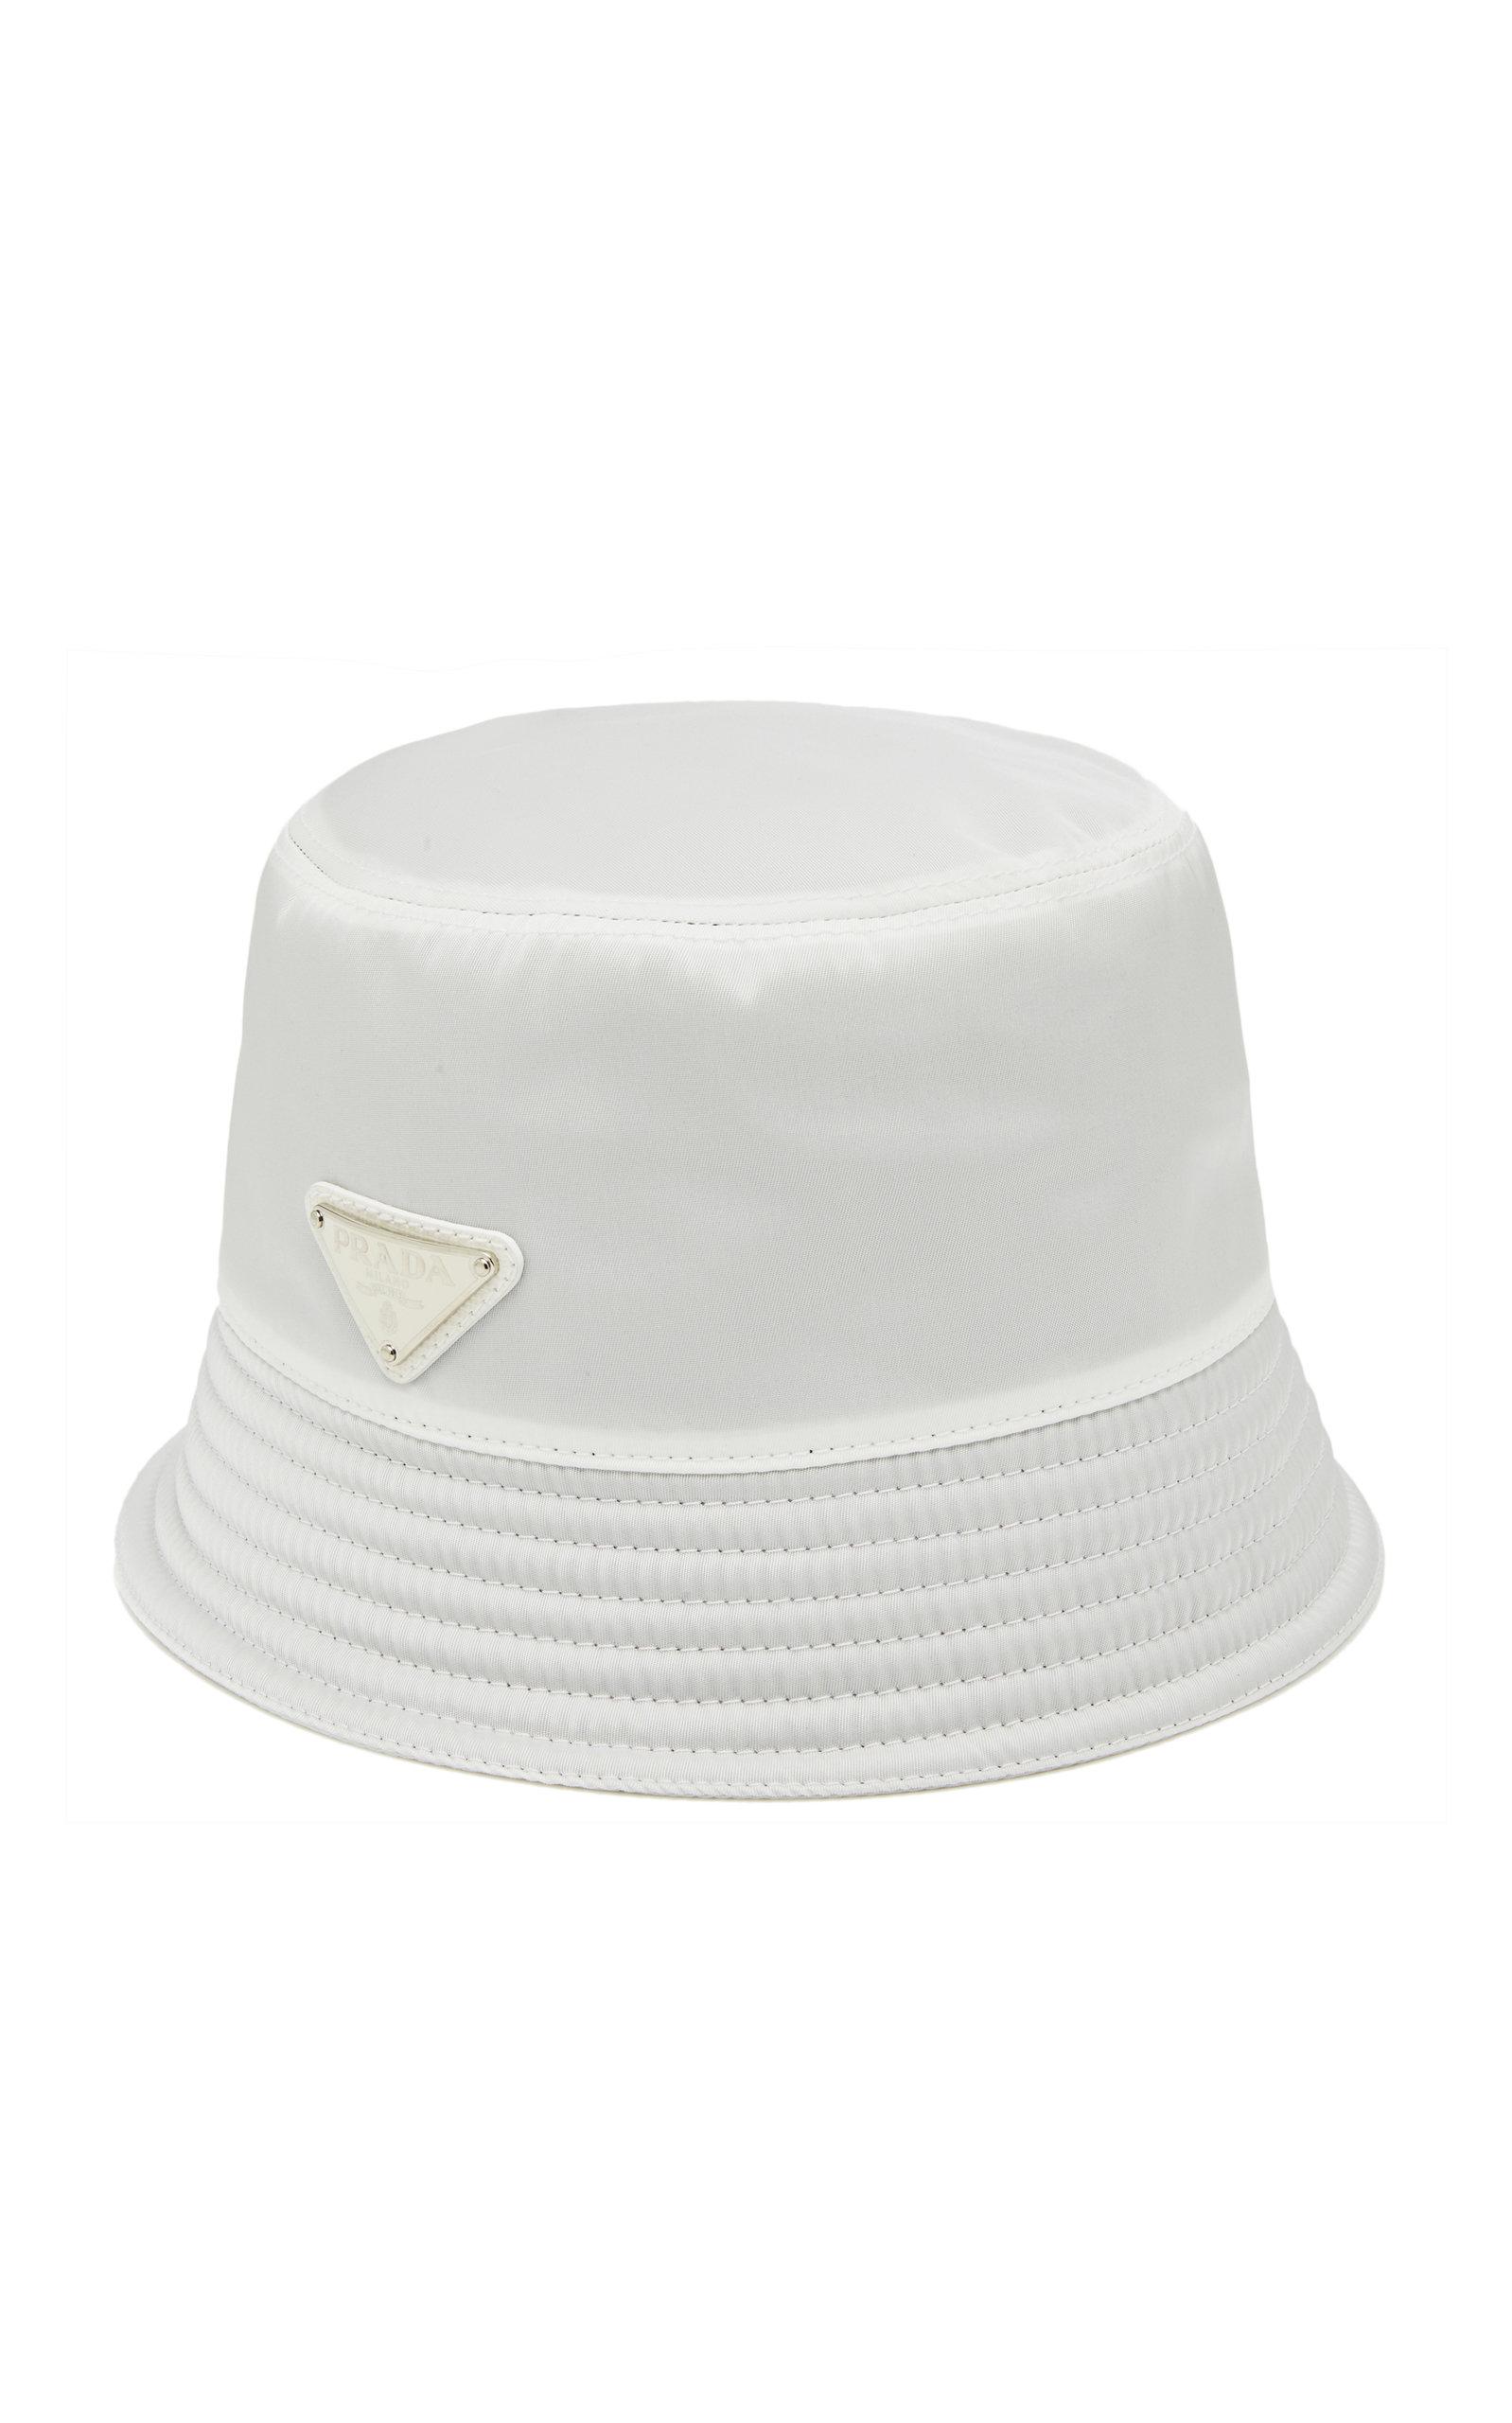 4cbeb928db85 PradaLogo-Appliquéd Nylon Bucket Hat. CLOSE. Loading. Loading